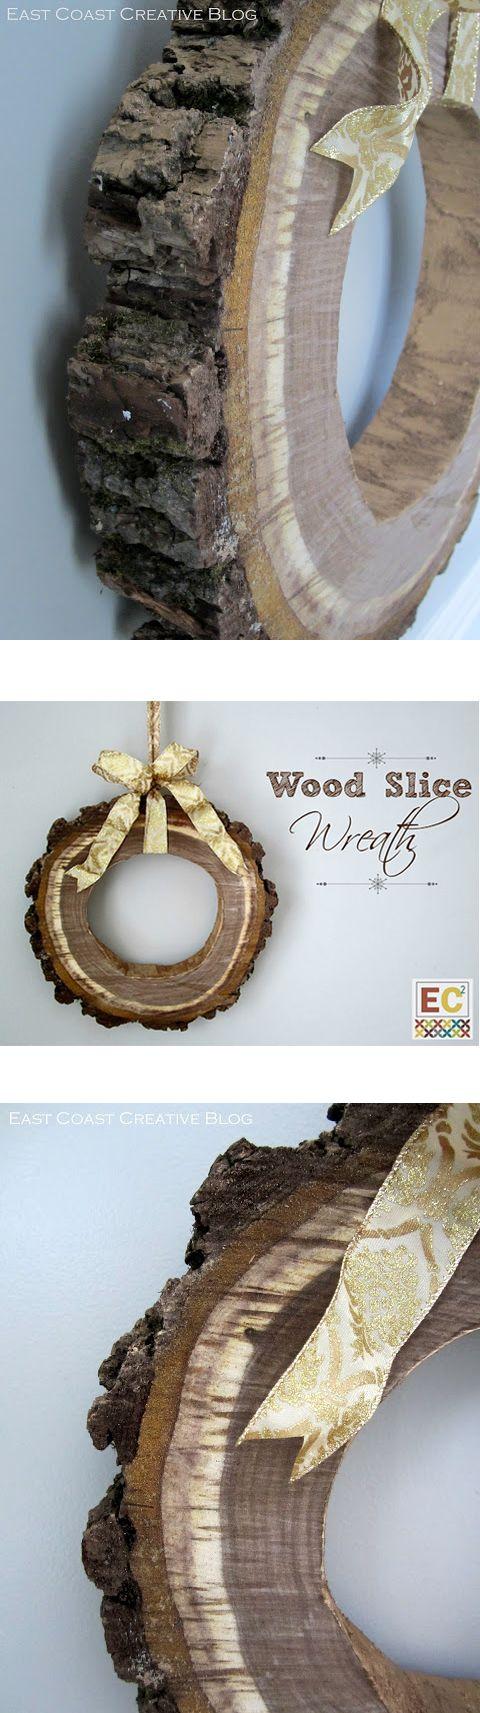 DIY Christmas Wreath from Wood at Shanty-2-Chic.com // Great project from eastcoastcreativeblog.com  Maar hoe kom ik aan zo'n schijf hout...?